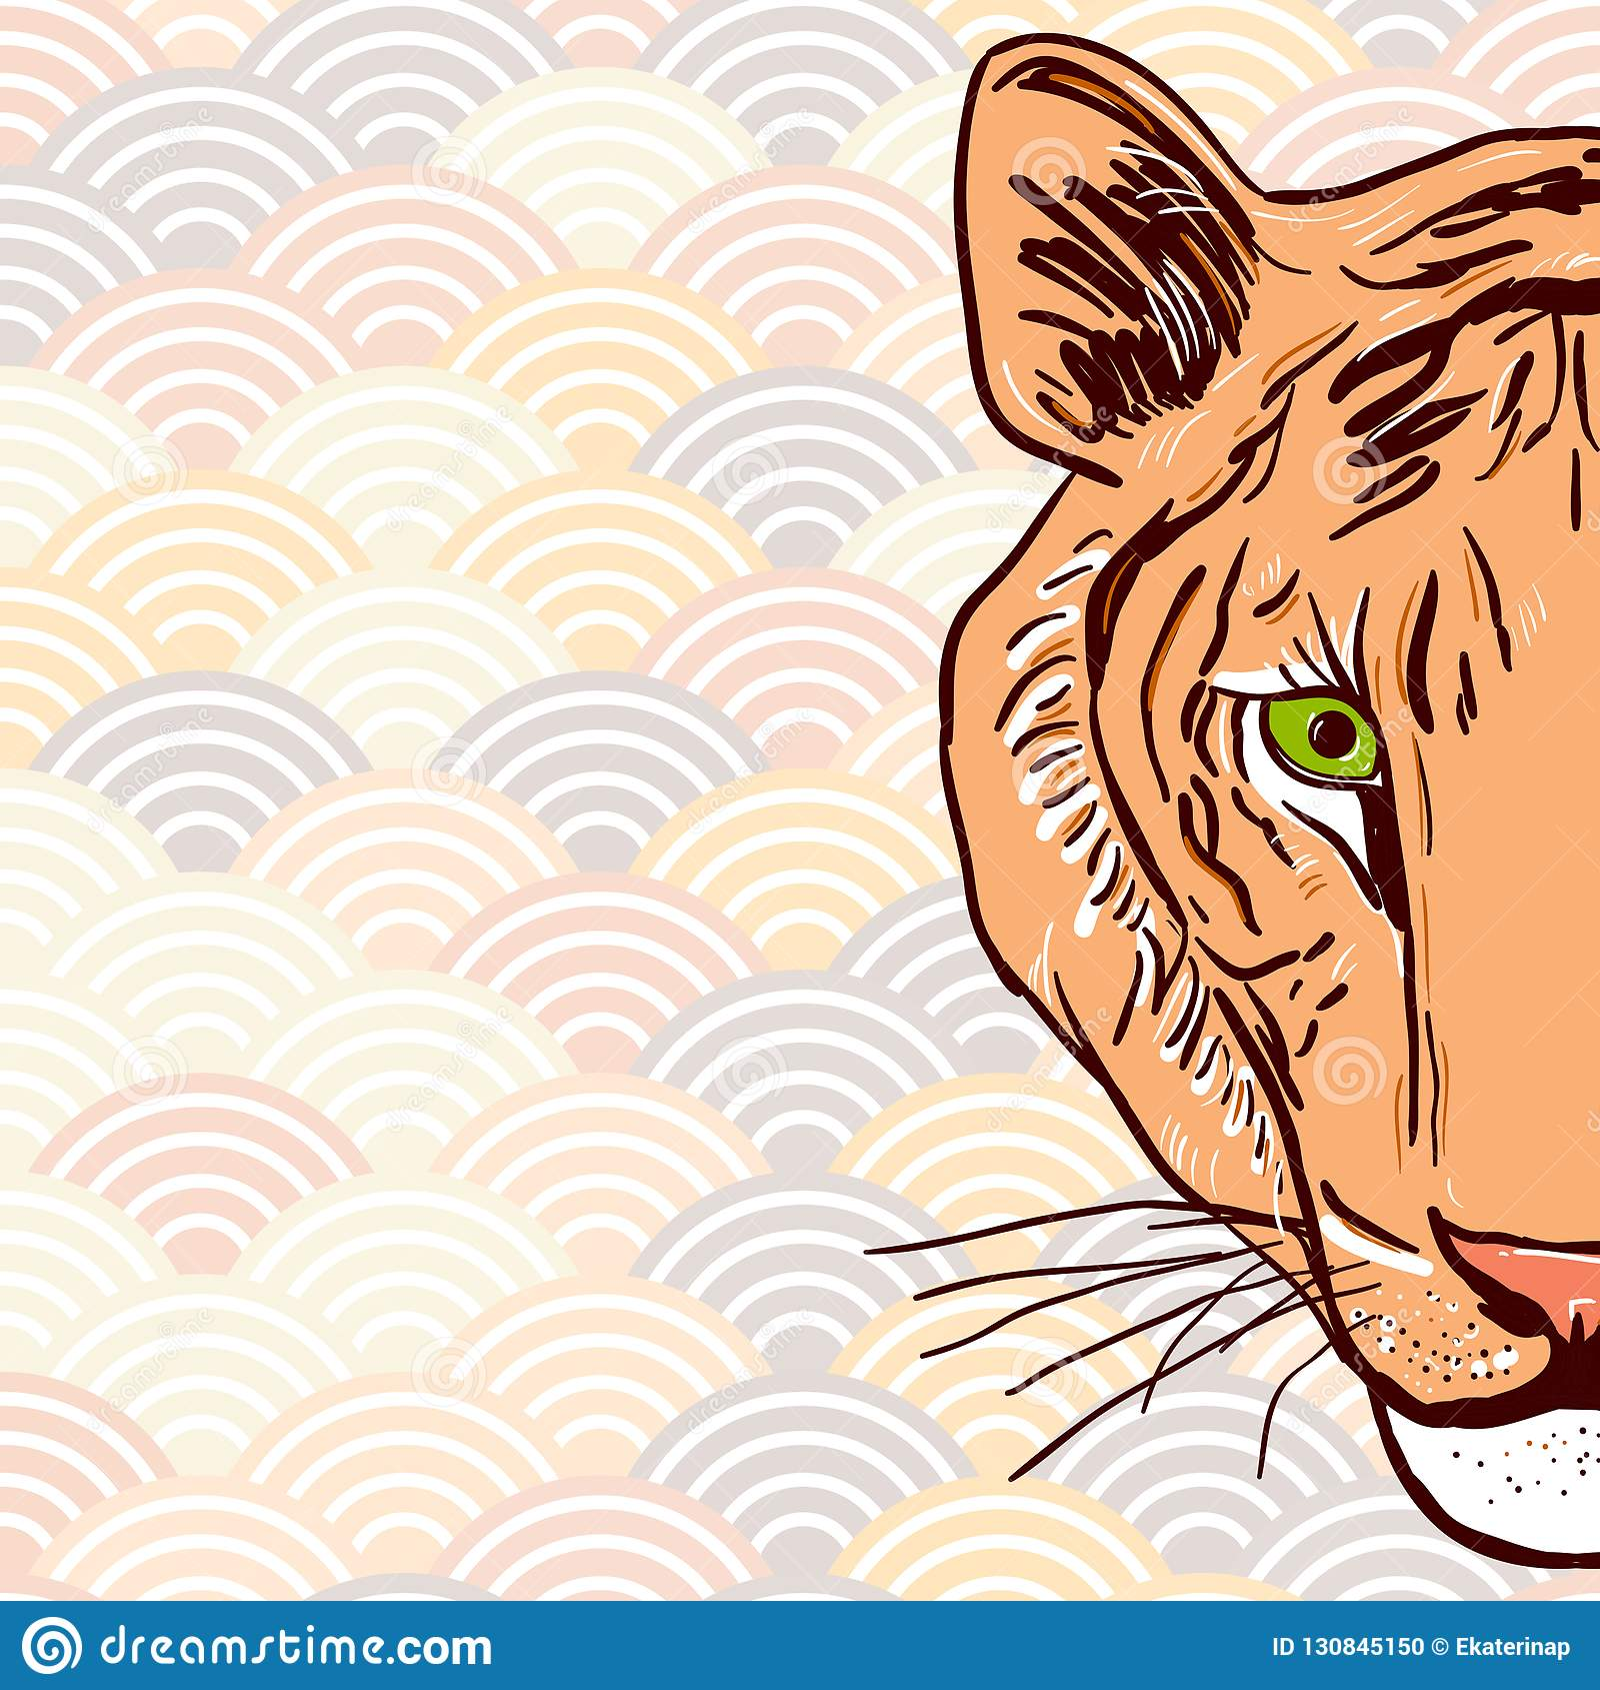 Dessin De Croquis De Tete De Tigre Dans Les Elements Ronds